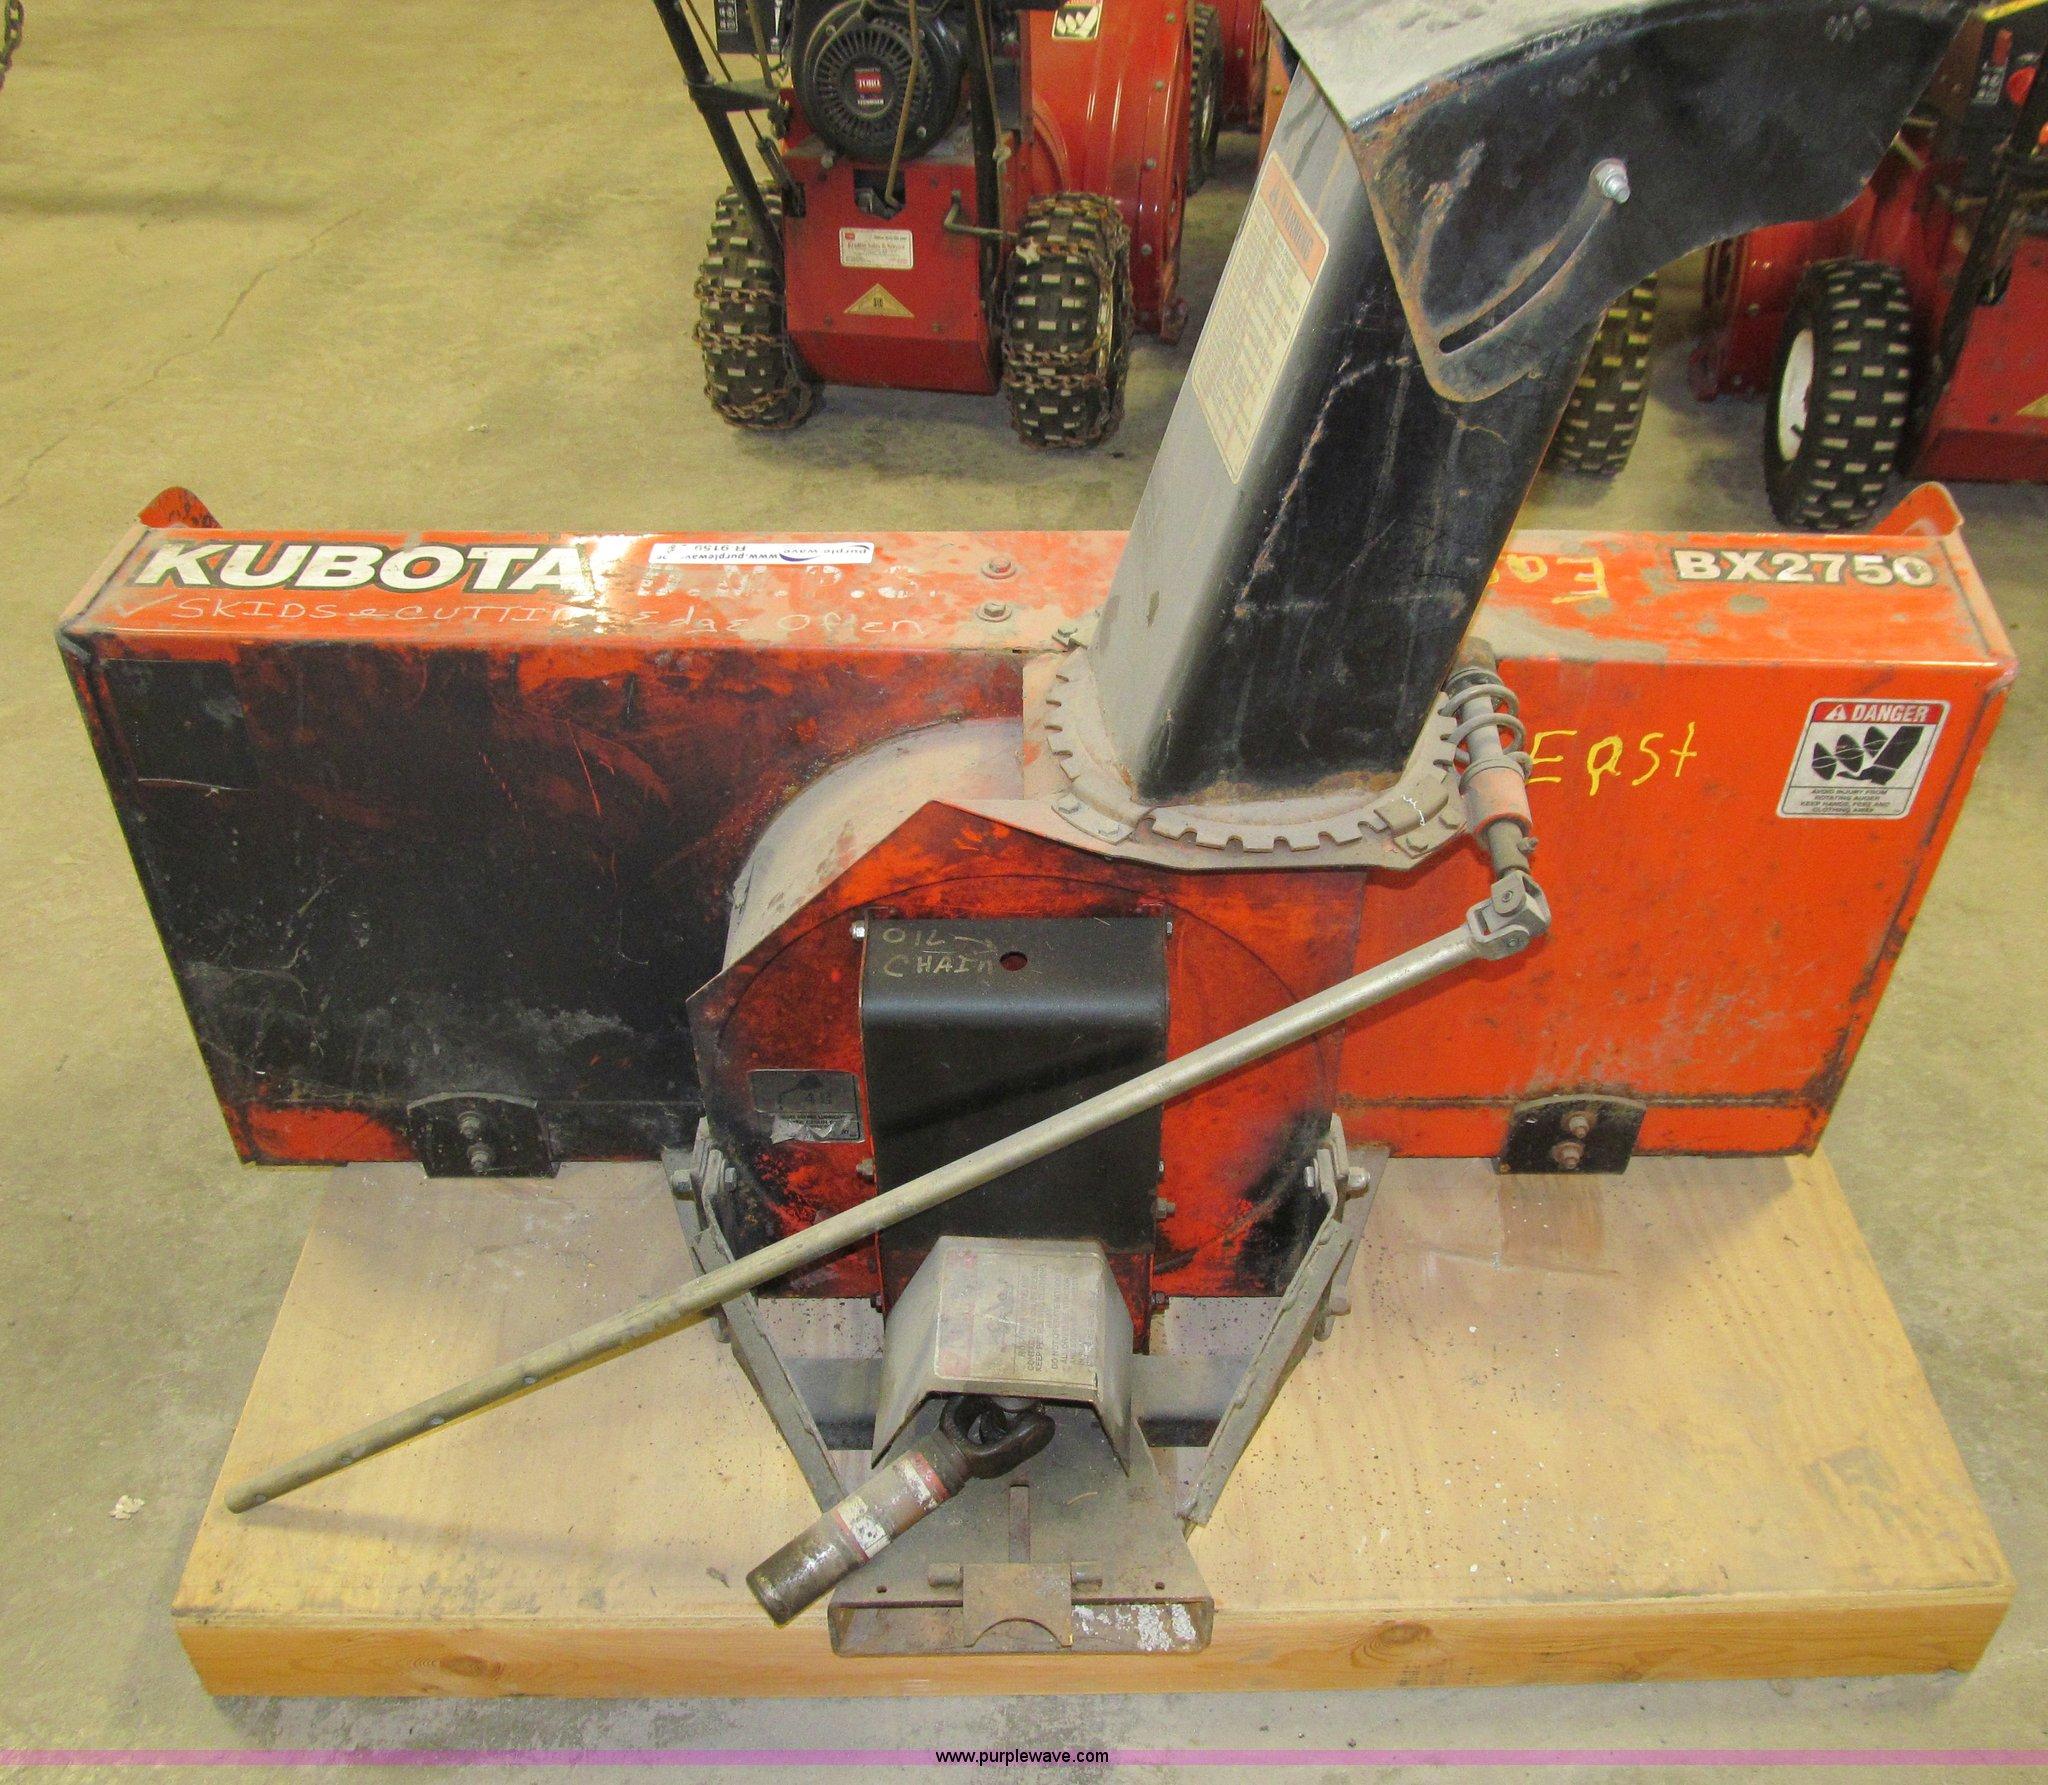 kubota bx2750 snow blower item r9159 sold may 6 governm rh purplewave com kubota bx2750d snow blower manual kubota bx2750d snowblower parts